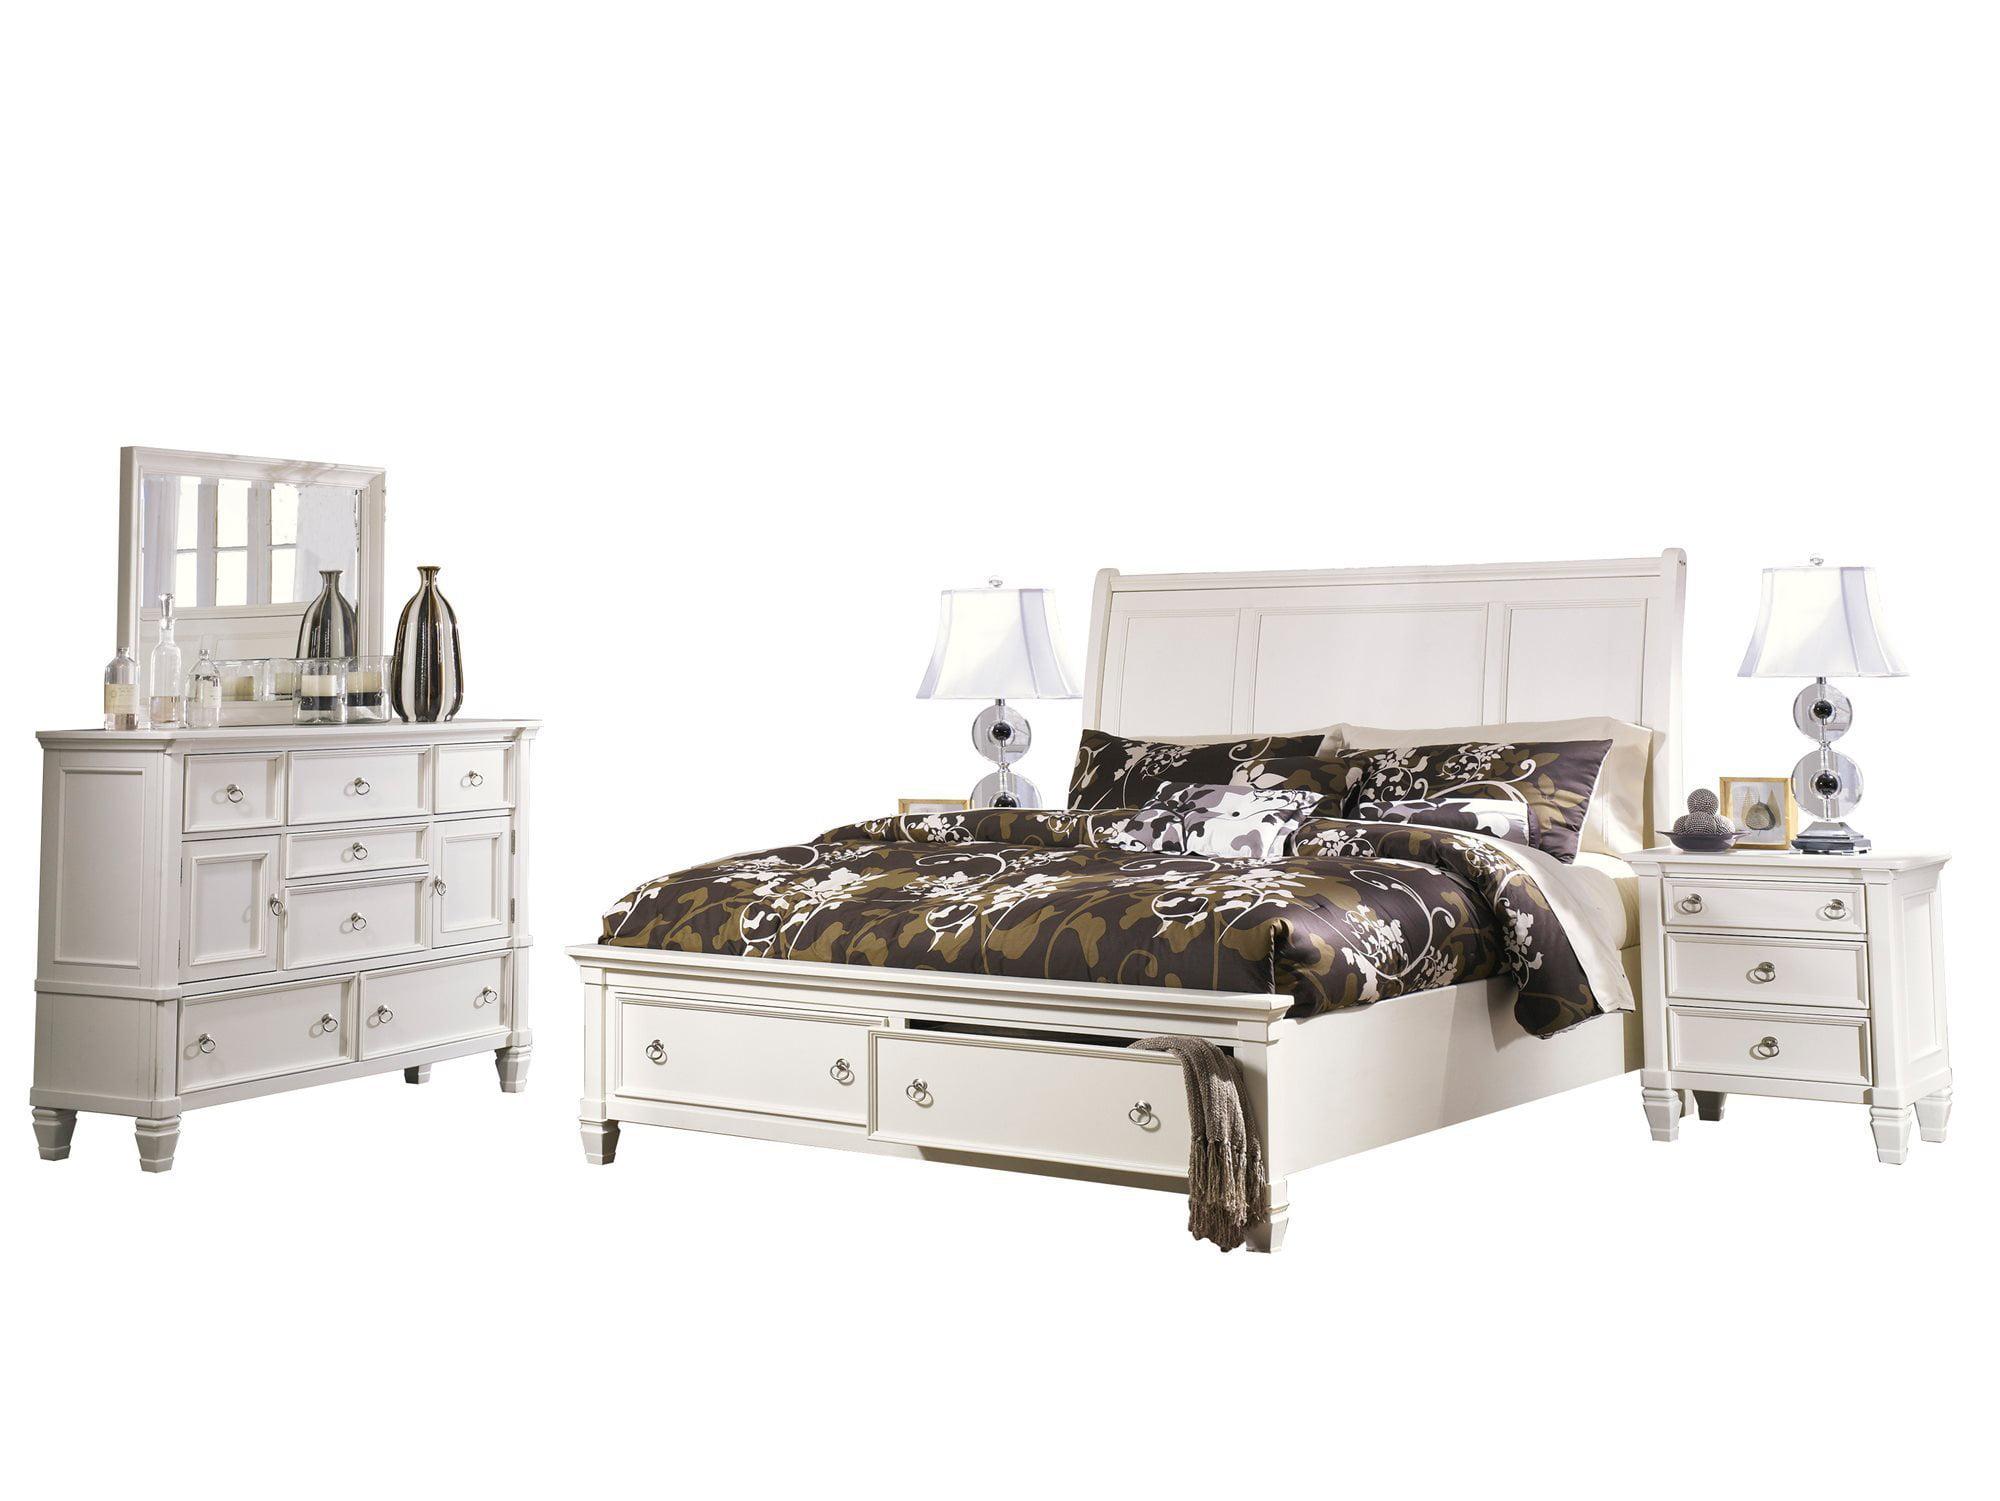 Ashley Furniture Prentice 5 PC Bedroom Set: Queen Sleigh ...